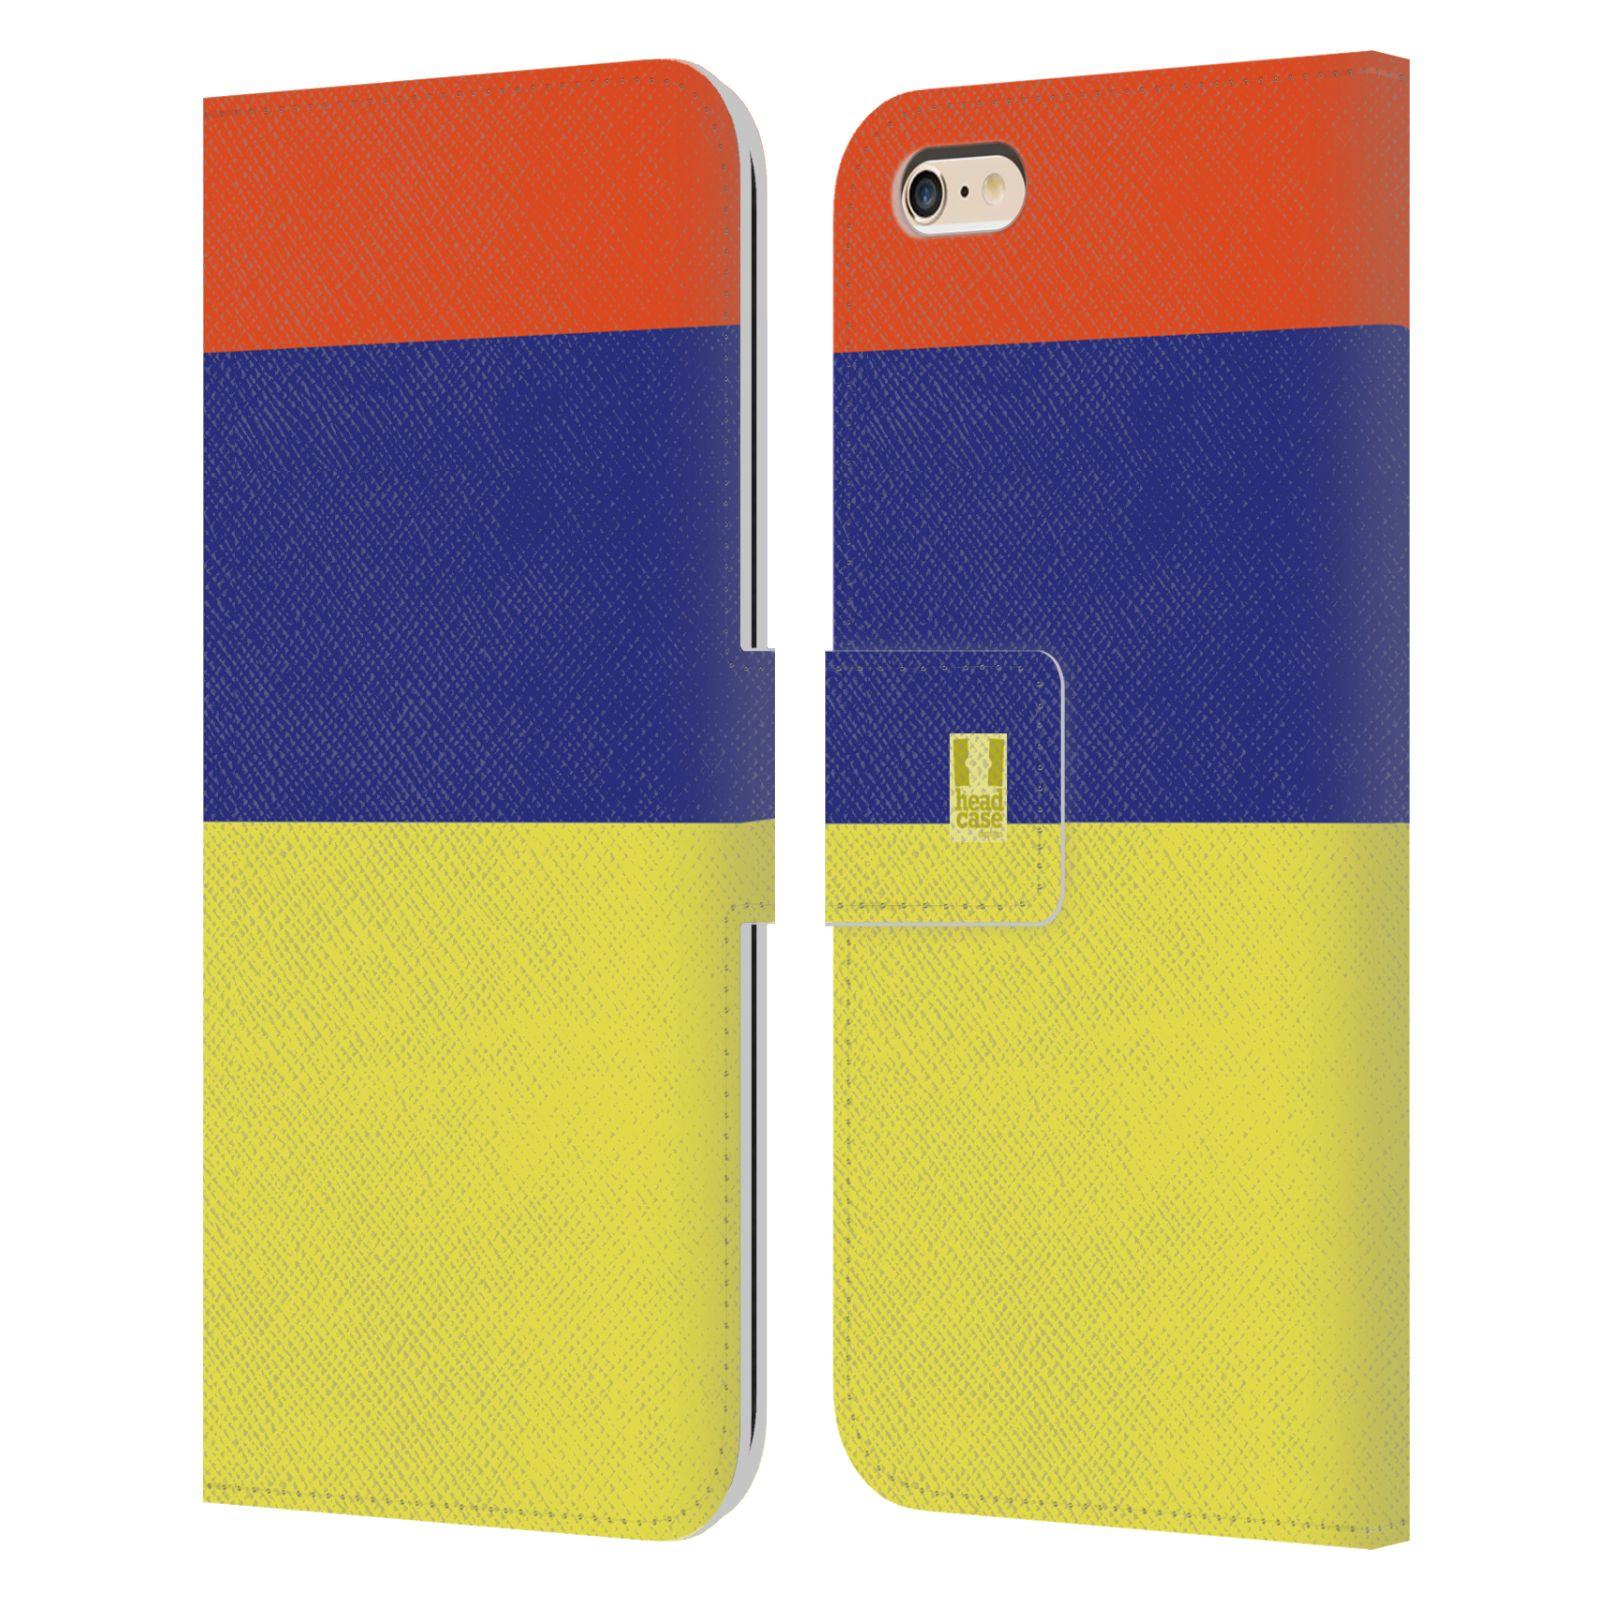 HEAD CASE Flipové pouzdro pro mobil Apple Iphone 6 PLUS/6S PLUS barevné tvary žlutá, modrá, červená